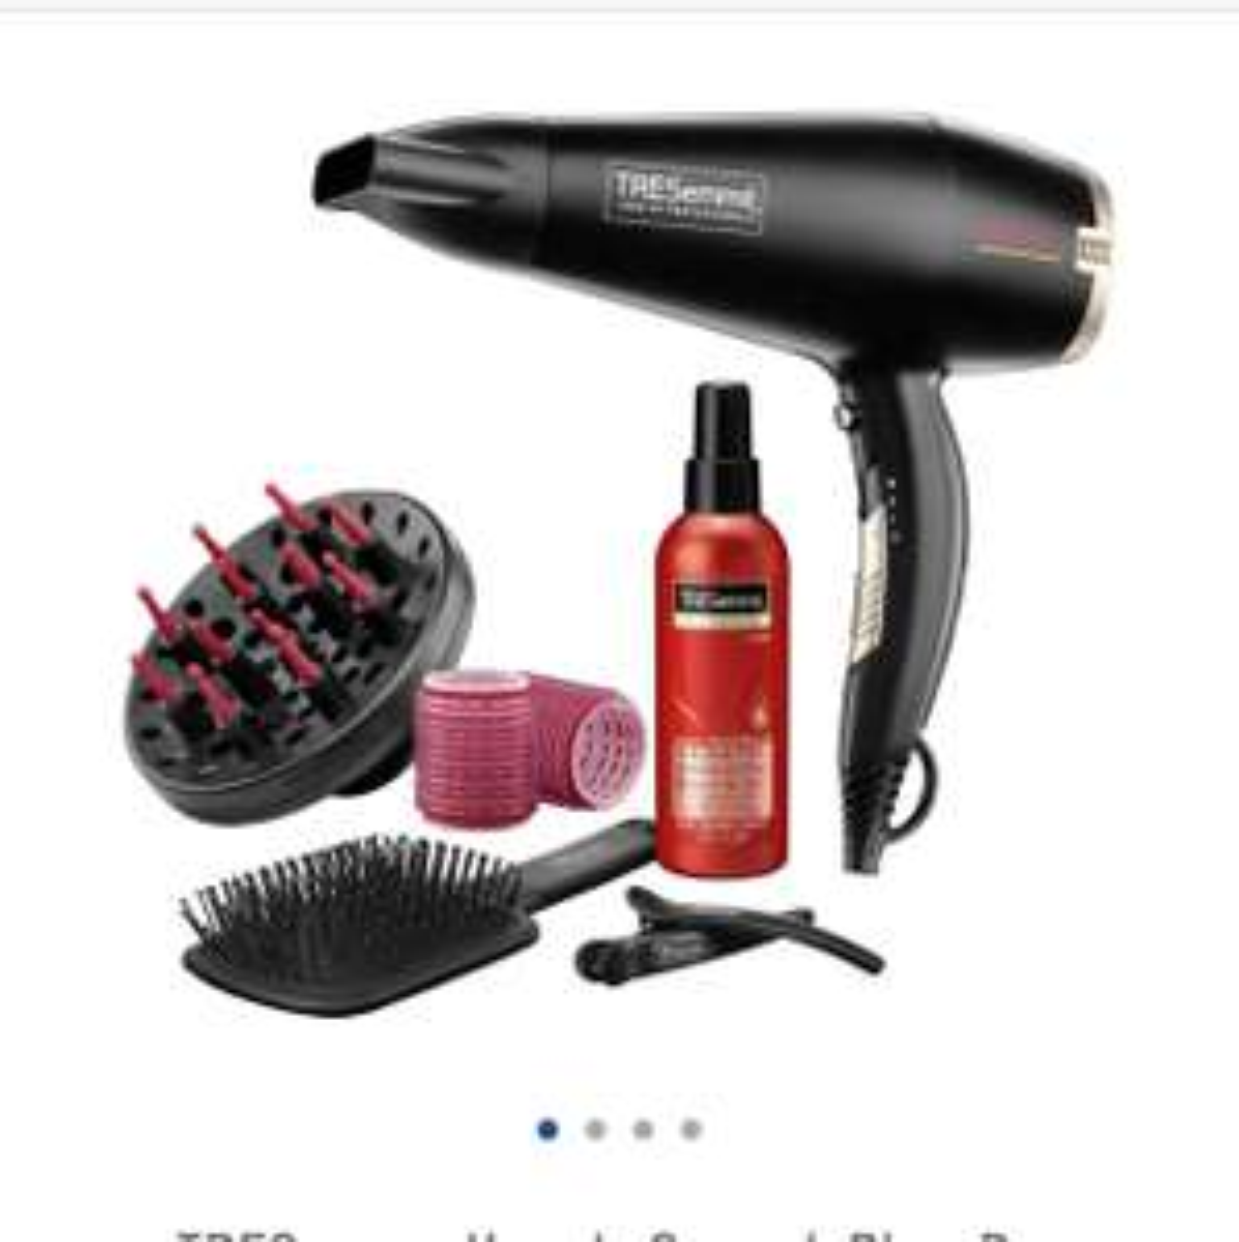 TRESemme Keratin Smooth Blow Dry Gift Set £21.99 @ Argos